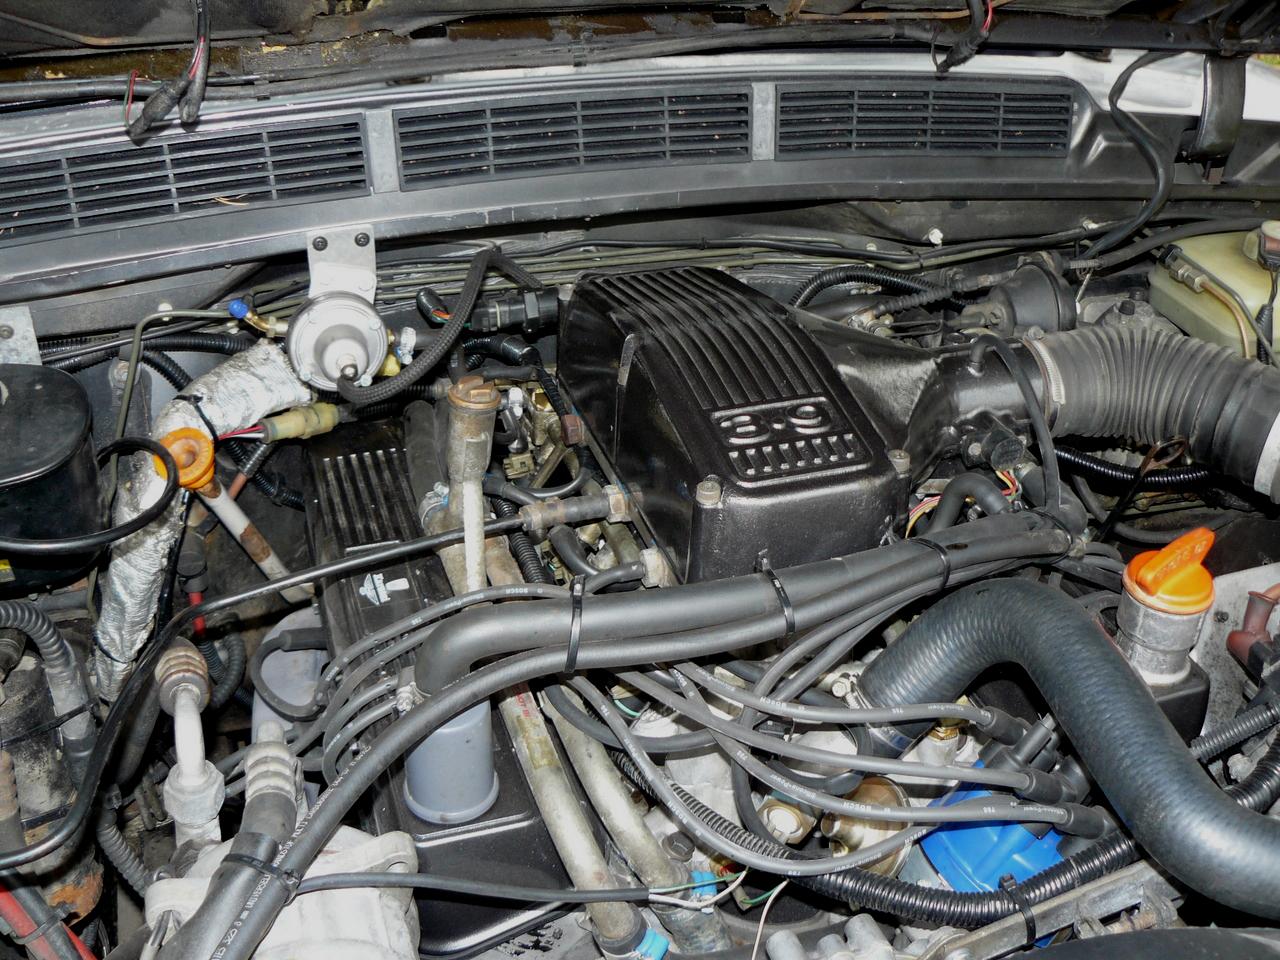 OW_7189] Range Rover Gems Wiring Diagram Wiring DiagramVell Usnes Kweca Tran Vira Favo Mohammedshrine Librar Wiring 101